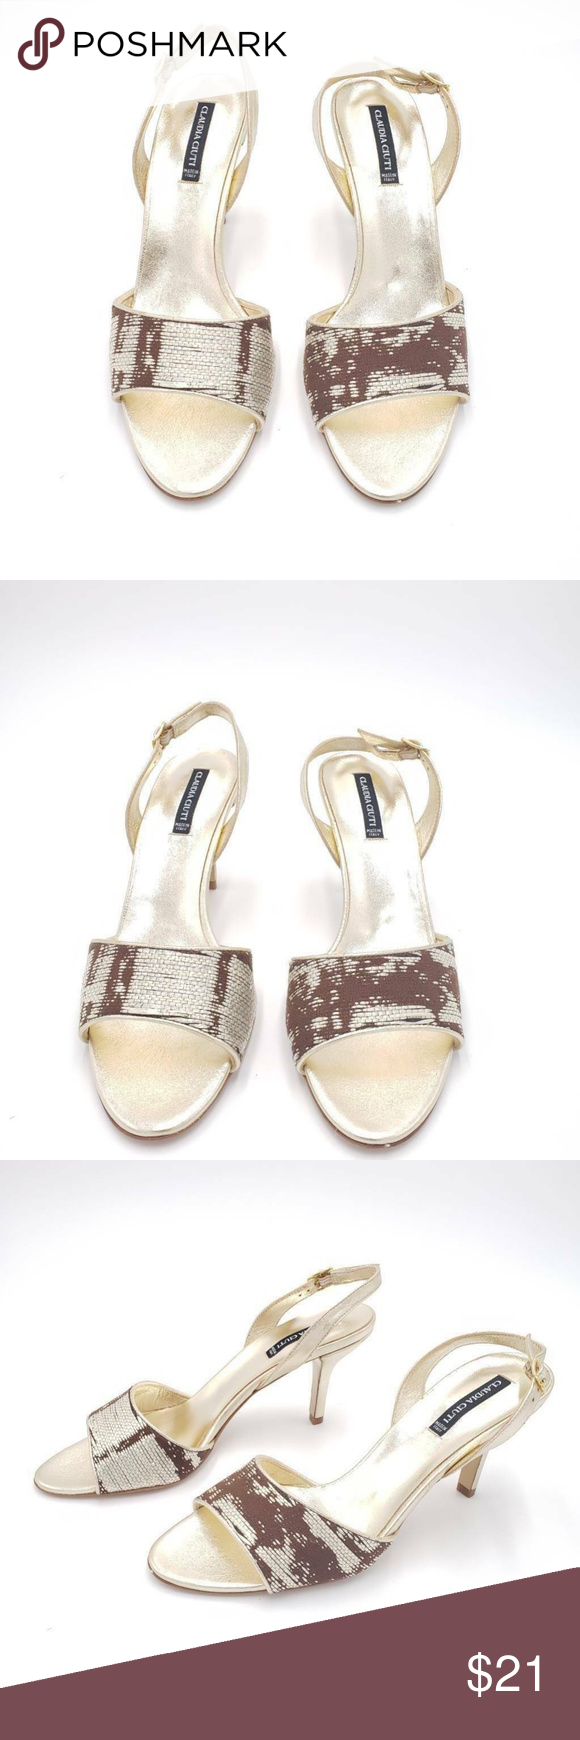 Claudia Ciuti Womens Sandals Brown Textured 9 Brown Sandals Womens Sandals Shoes Women Heels